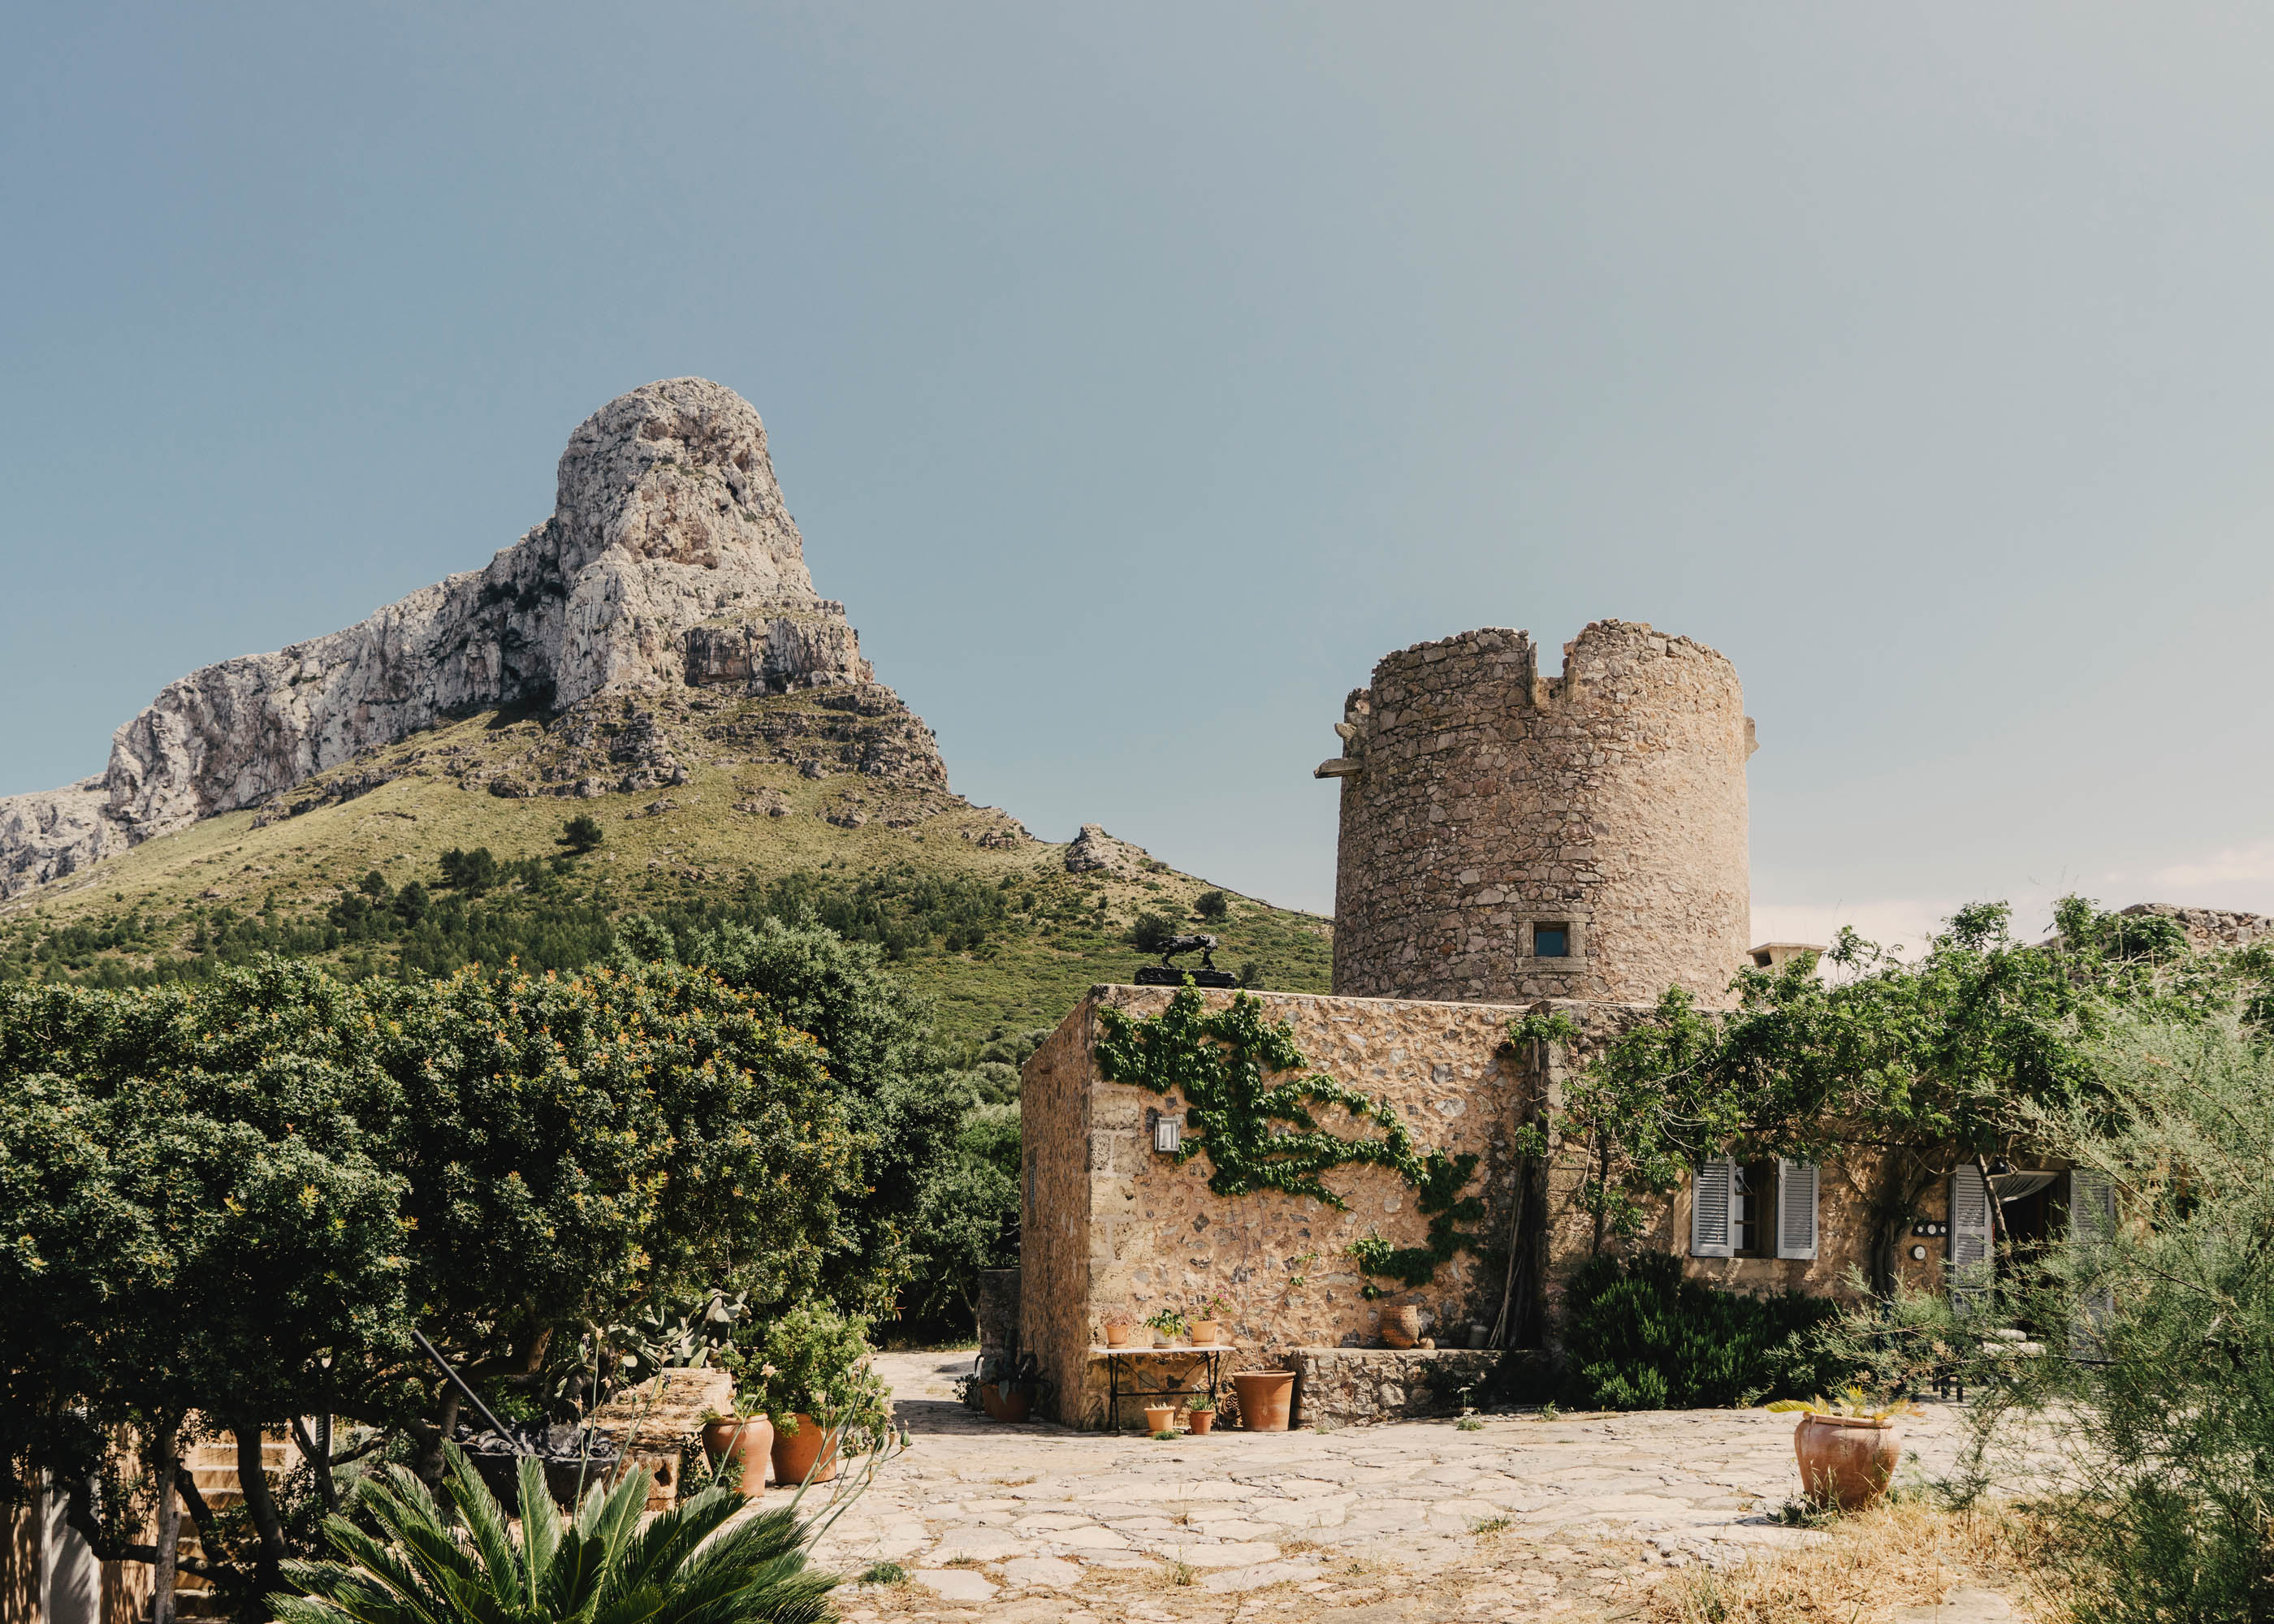 #miquelbarcelo #artist #house #mallorca #editorial #wsj #wallstreetjournal #architecture